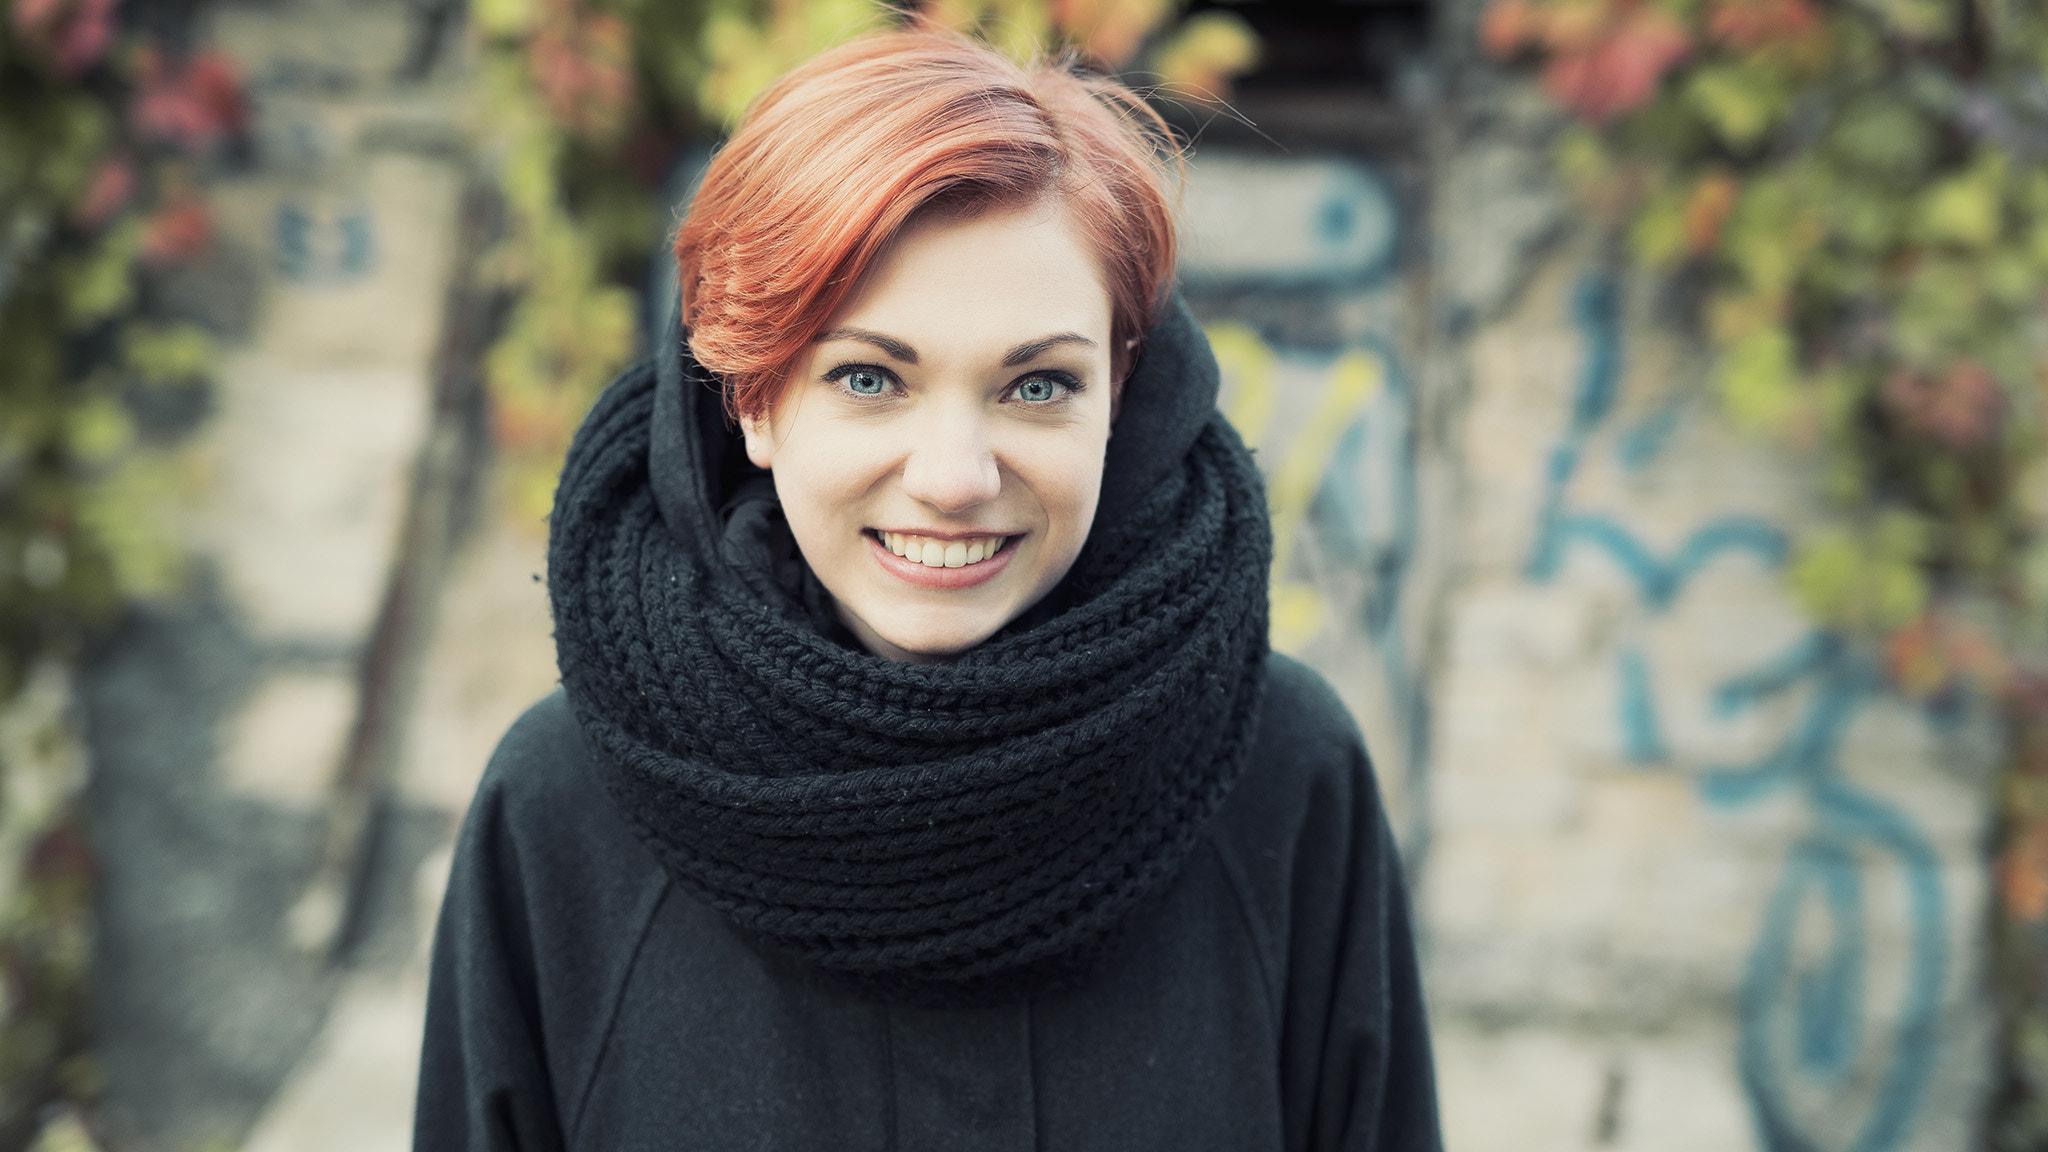 wanita model wanita di luar ruangan 500px melihat viewer si rambut merah syal tersenyum rambut pendek